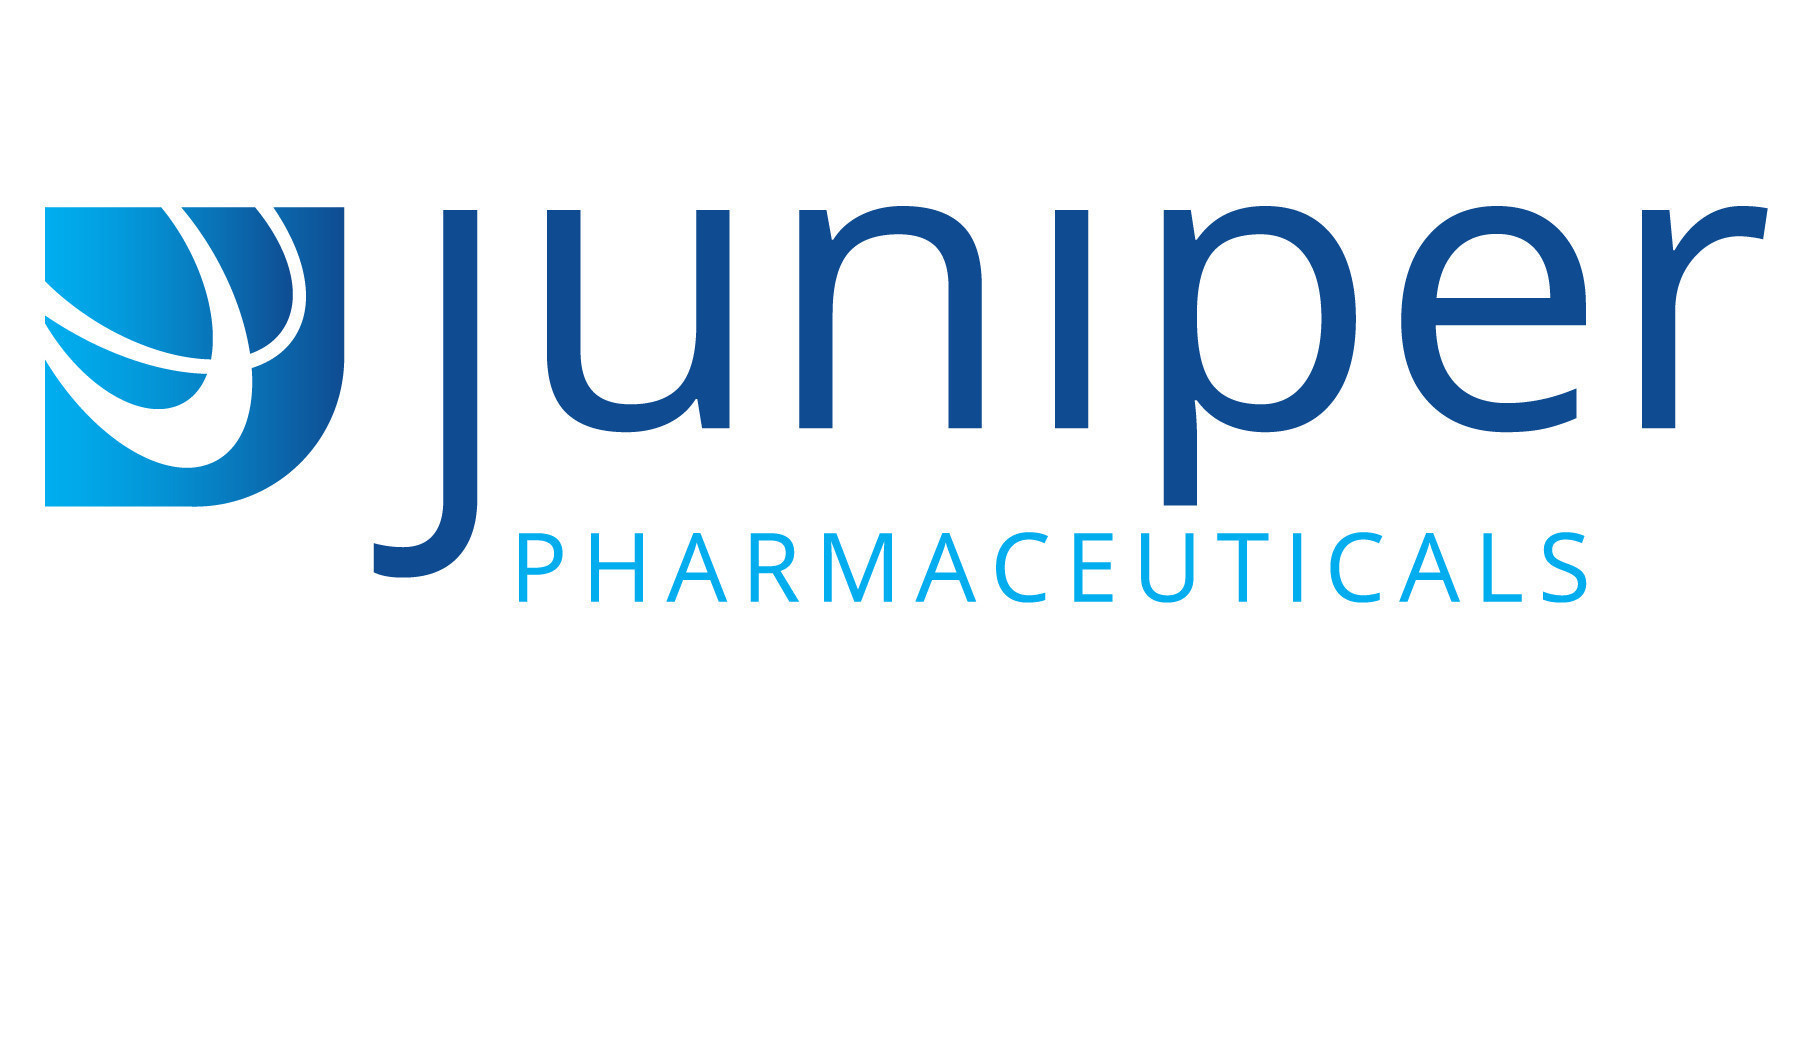 Juniper Pharmaceuticals, Inc. (PRNewsFoto/Juniper Pharmaceuticals, Inc.)